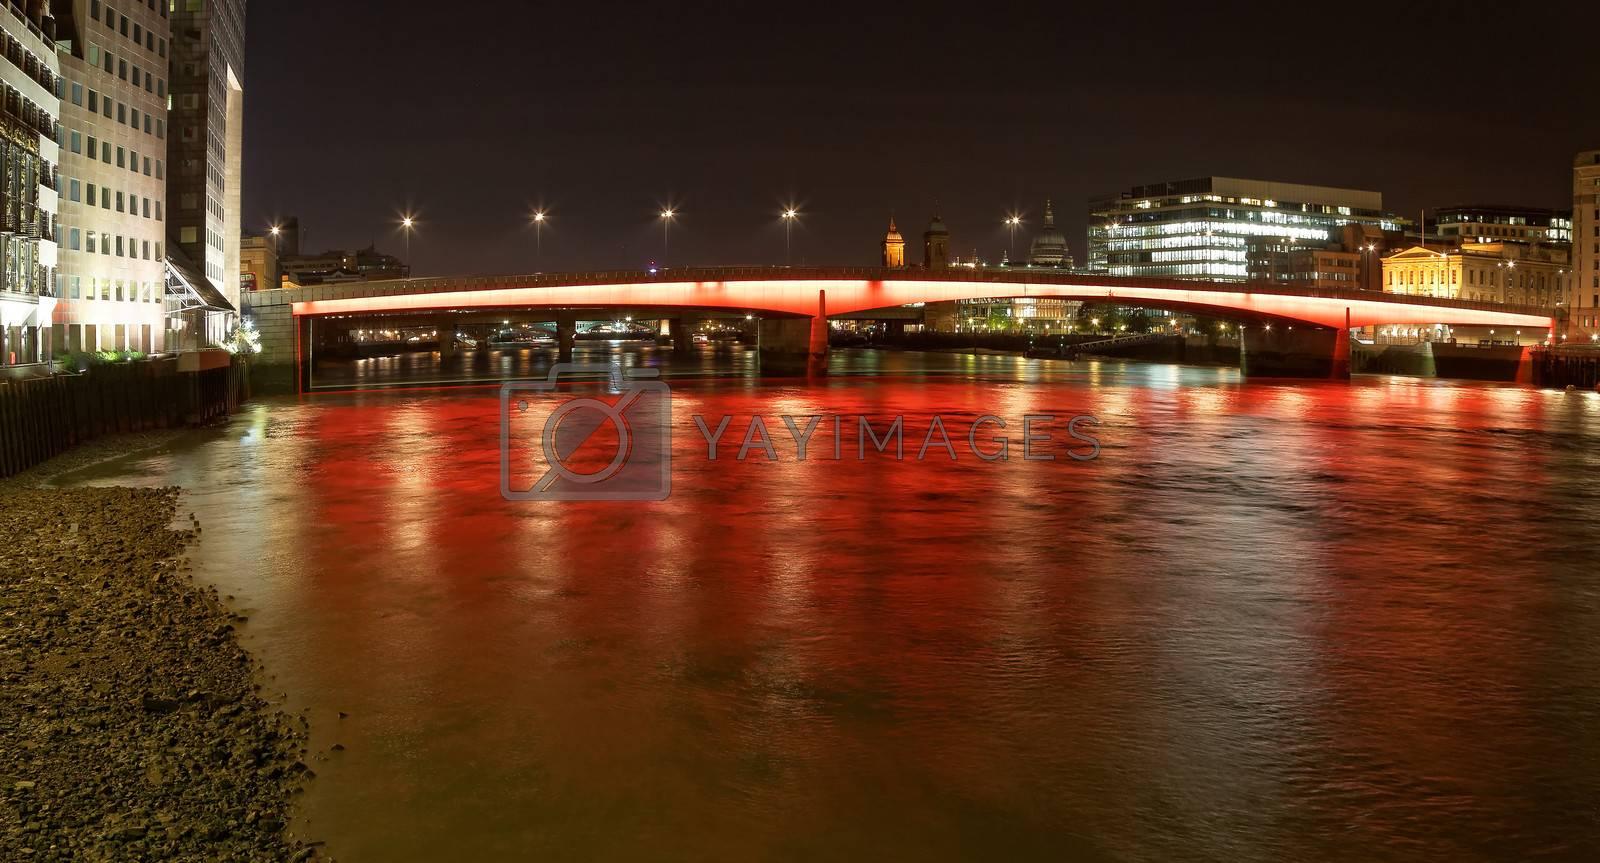 London Bridge with red and orange lights